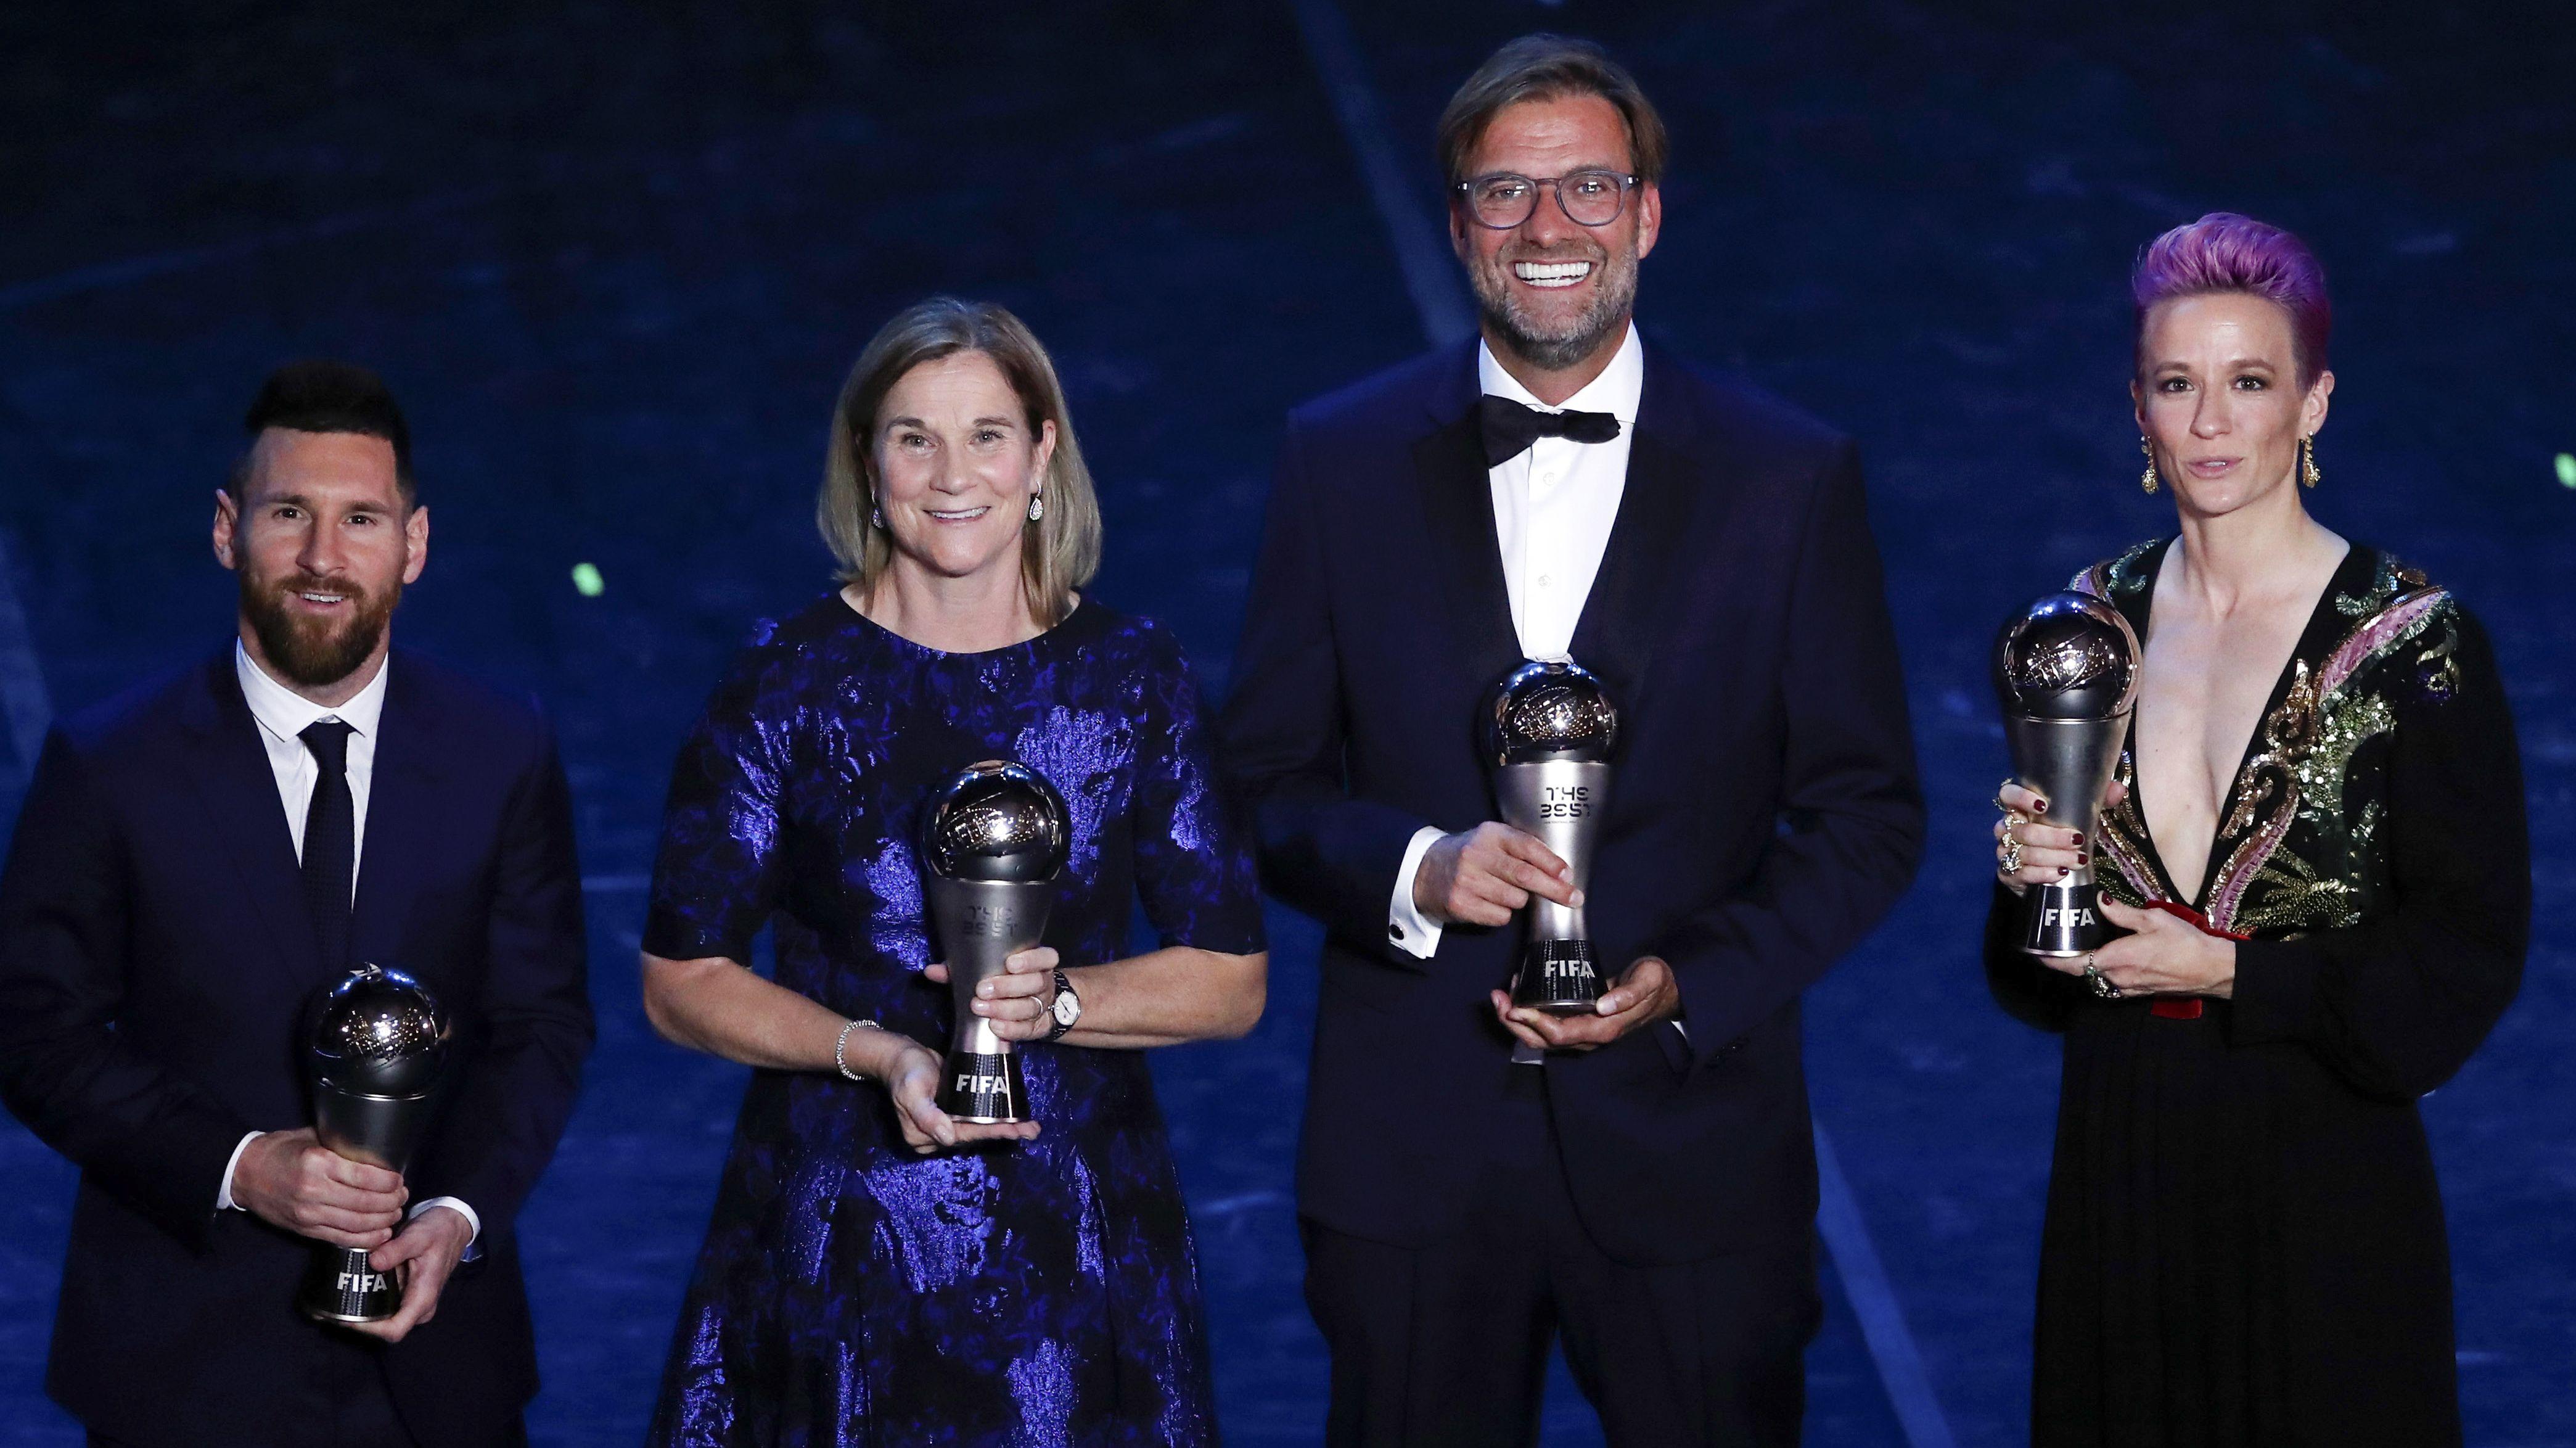 Lionel Messi, Jill Ellis, Jürgen Klopp, Megan Rapinoe (von links)